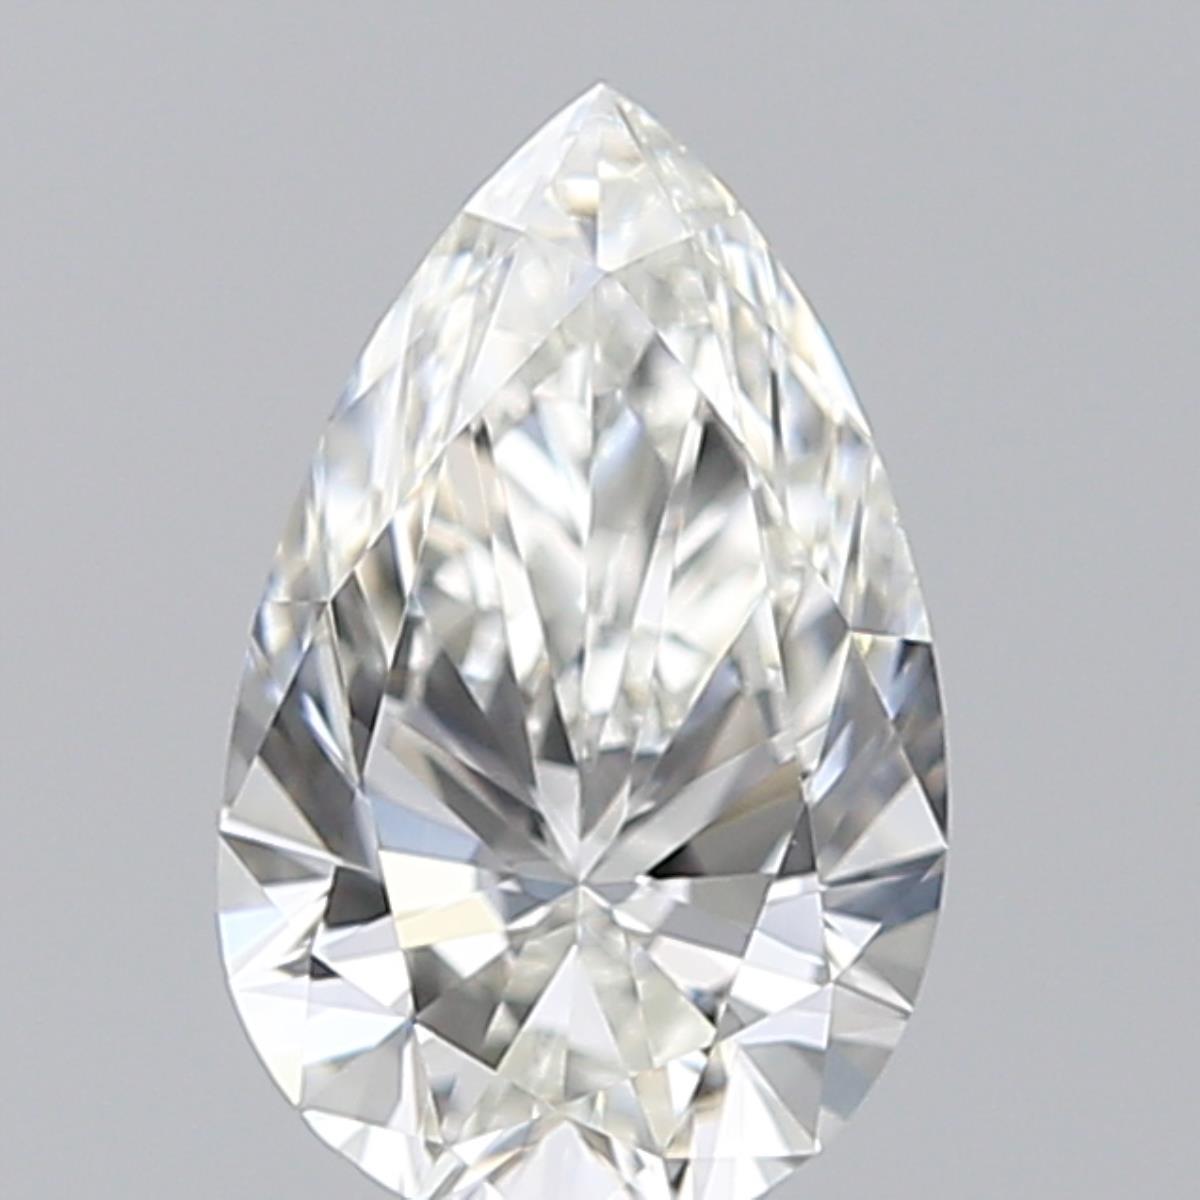 0.72 ct Pear Shape Diamond : H / VVS1